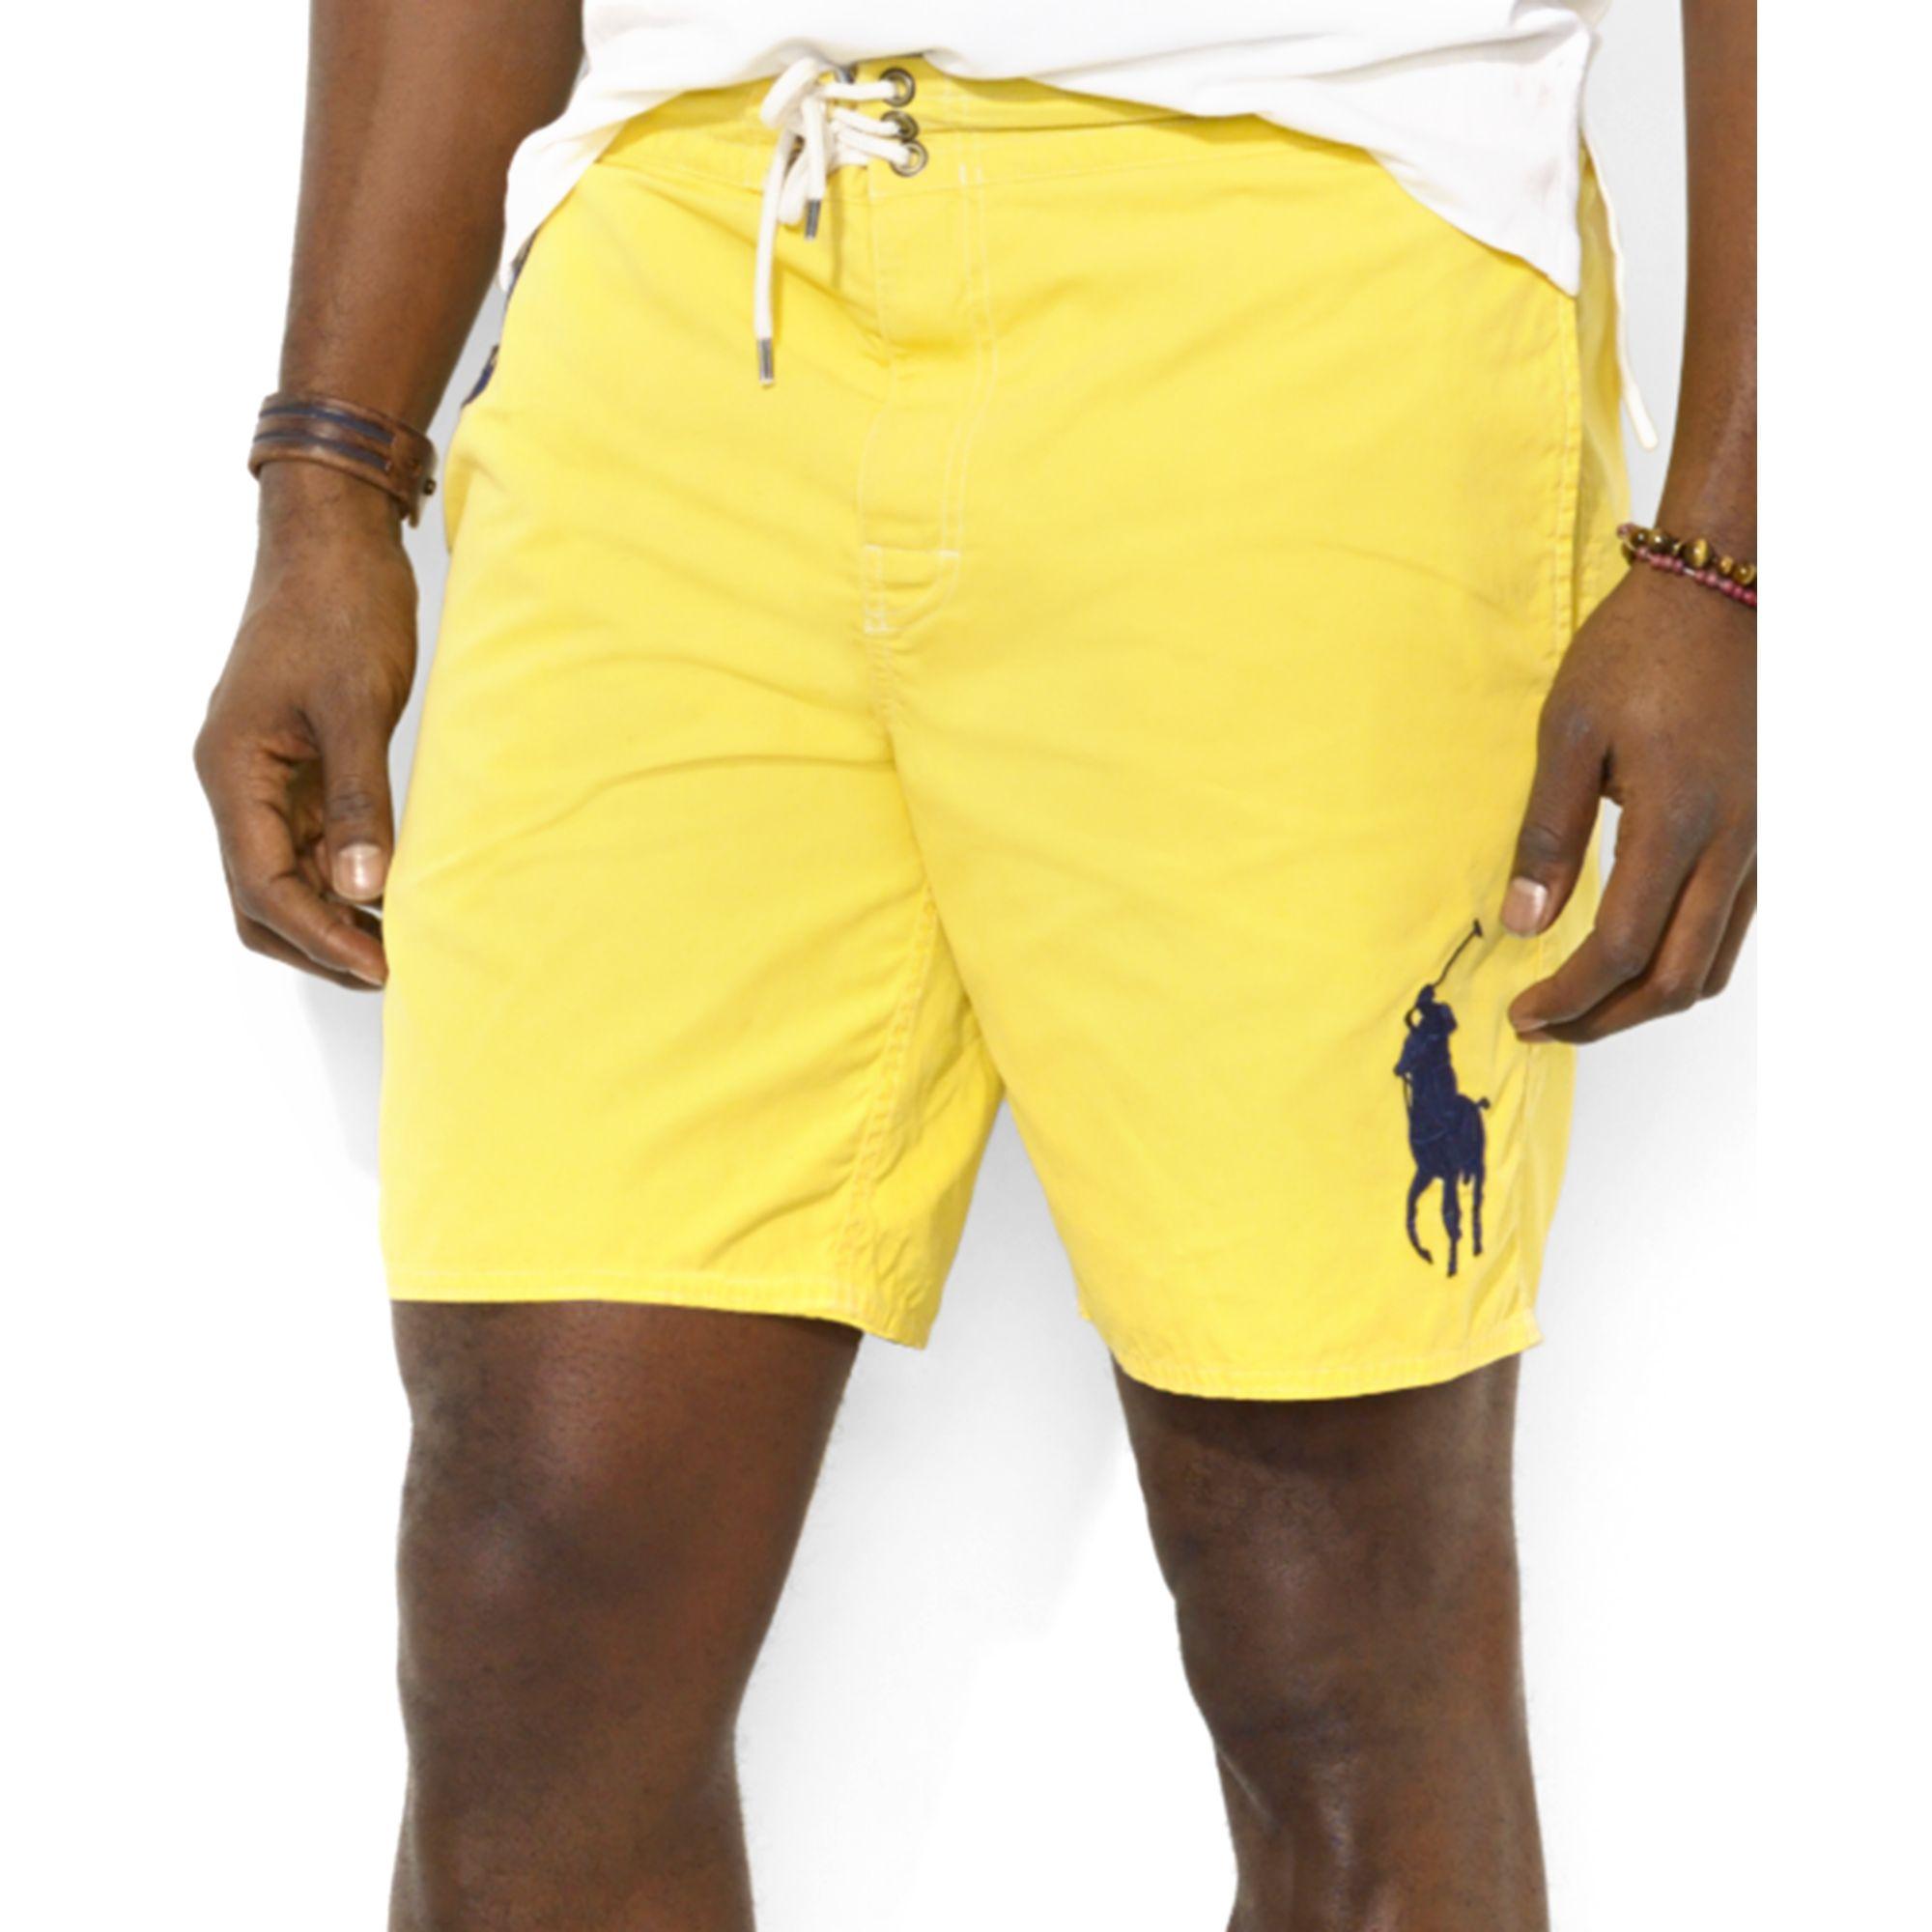 aeecd389c7aa4 ... closeout lyst ralph lauren polo big and tall sanibel swim shorts in  yellow 78db3 9ac85